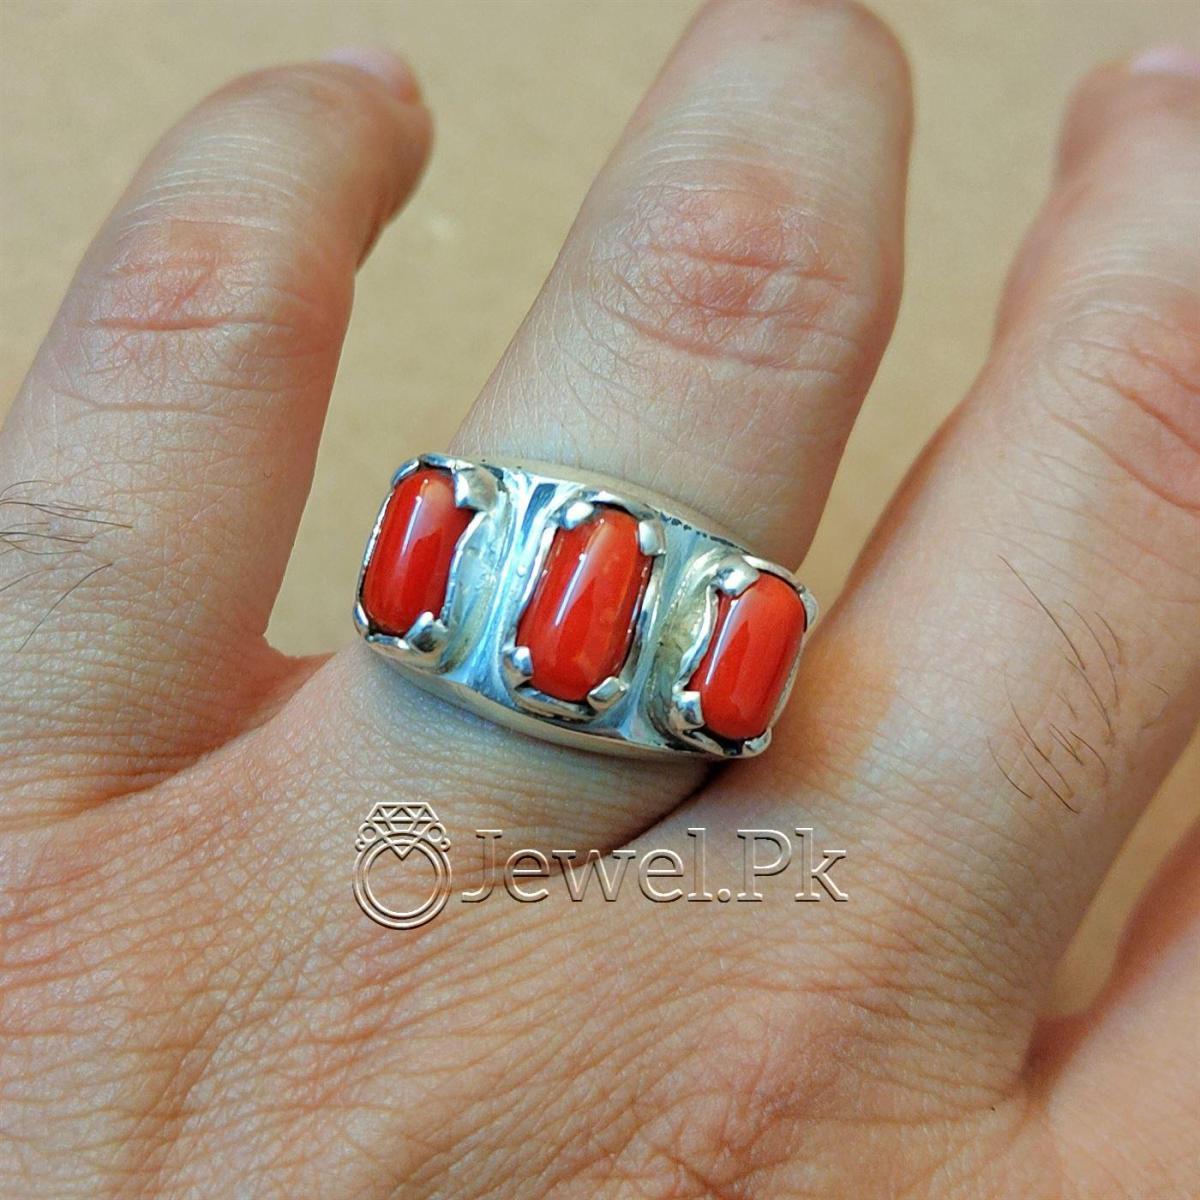 Natural Coral Marjan Ring Handmade 925 Silver Marjan stone 11 natural gemstones pakistan + 925 silver jewelry online